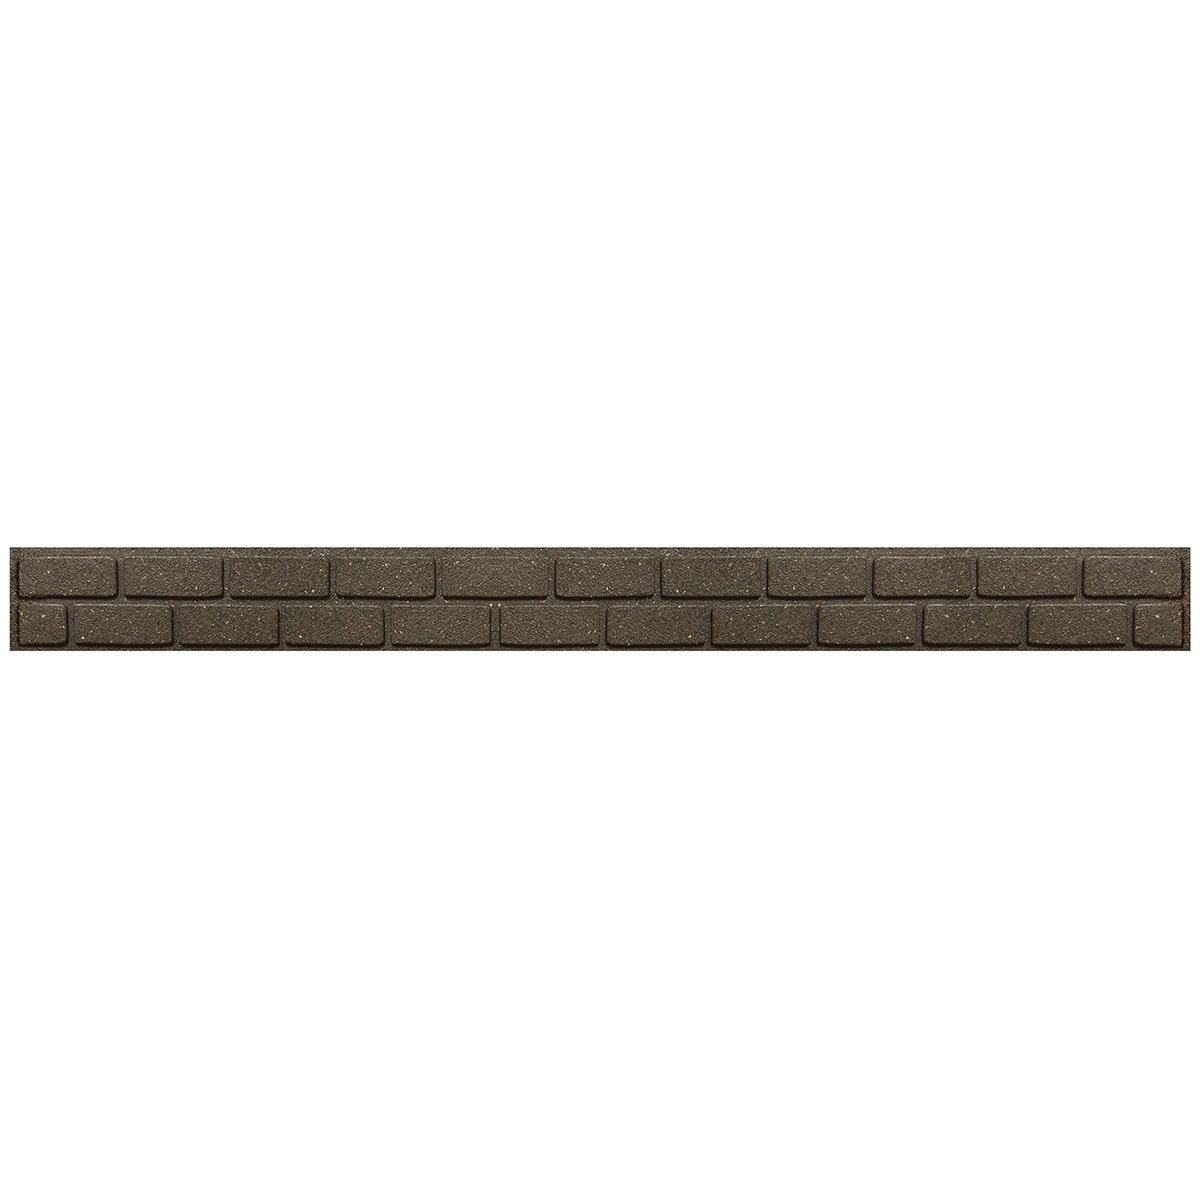 Rasenkante Mauer 6er-Set, 720 cm, braun | #2